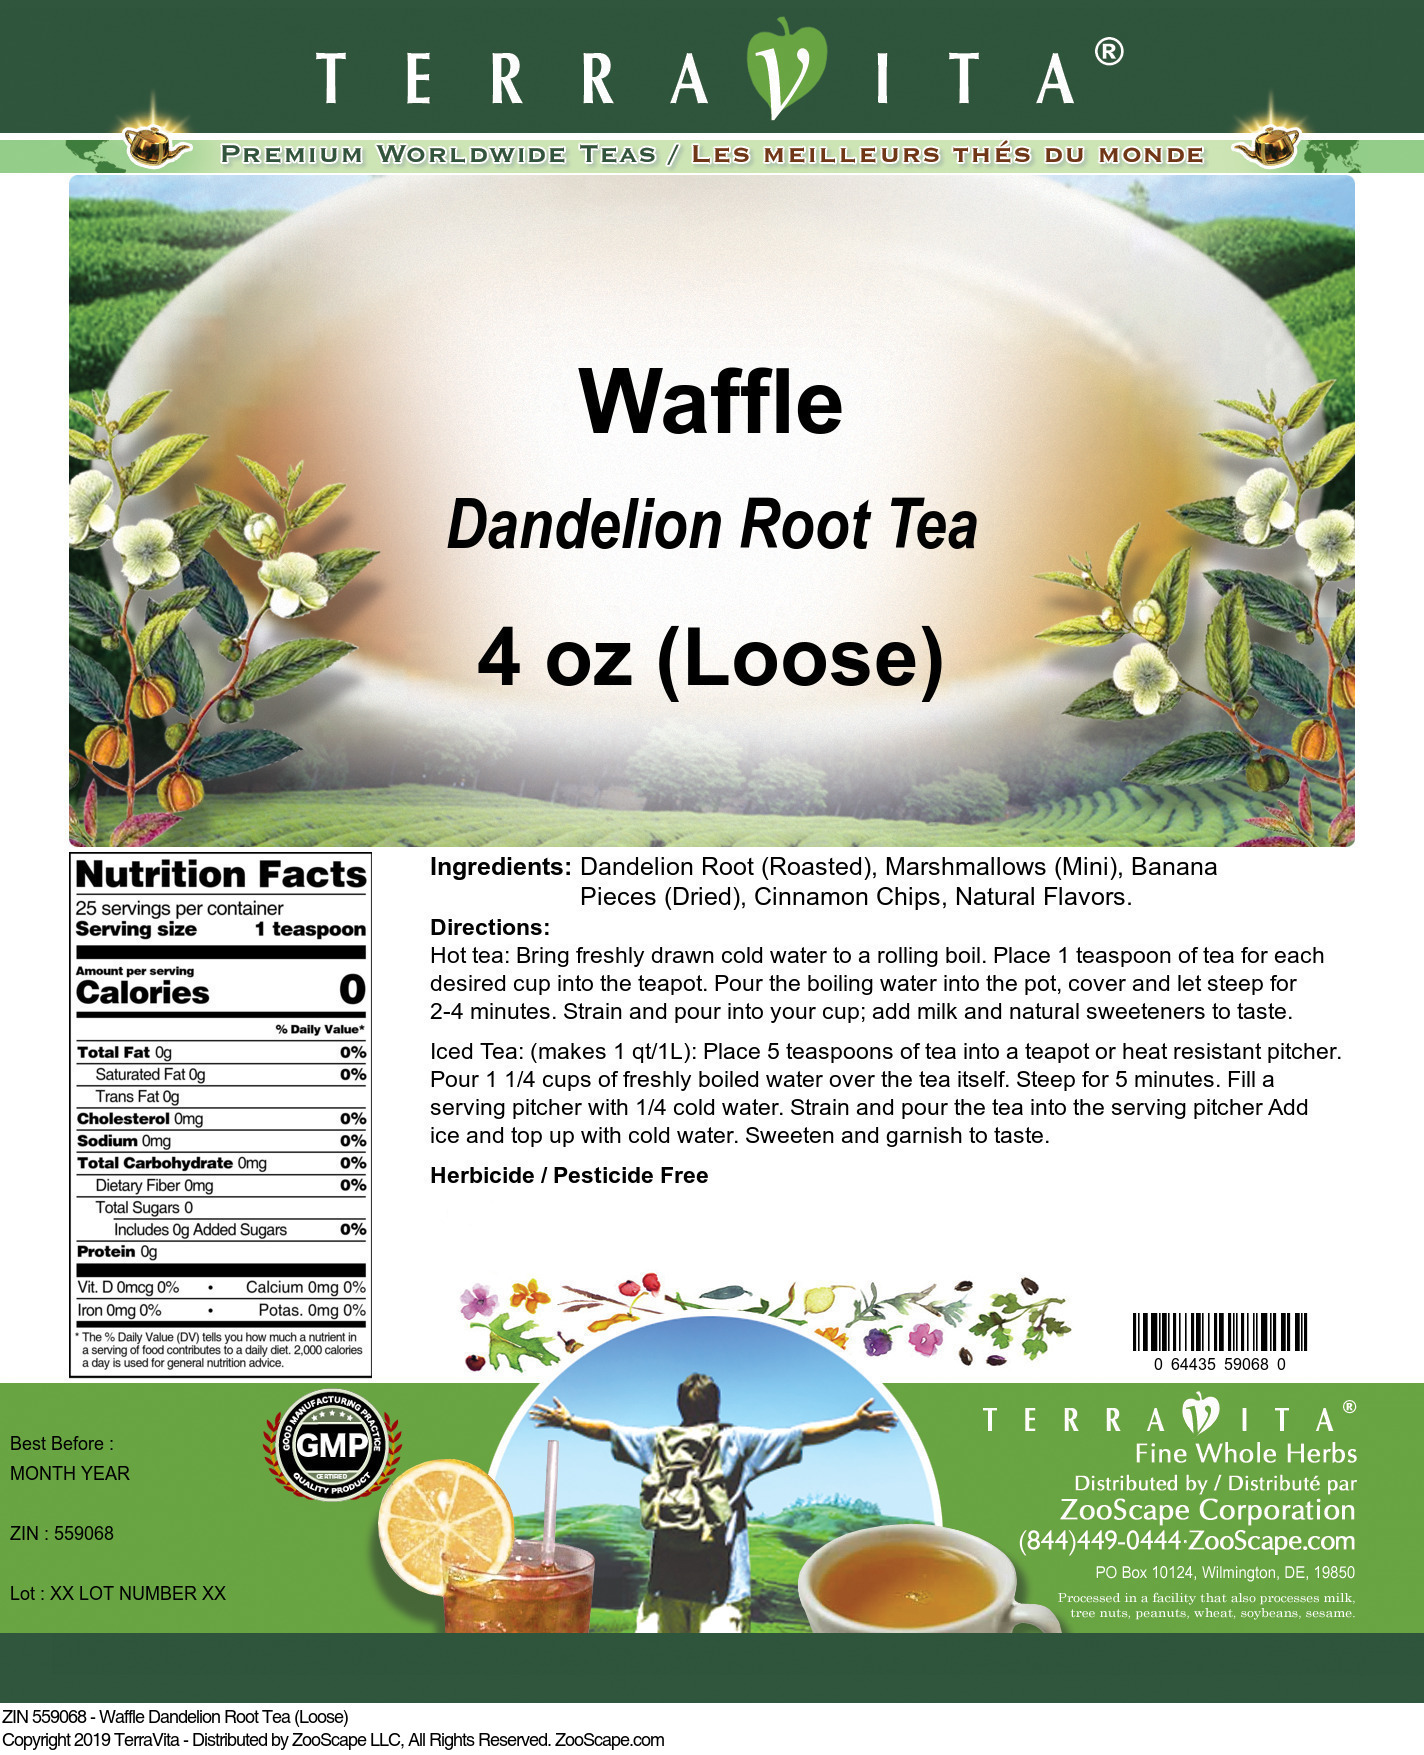 Waffle Dandelion Root Tea (Loose)